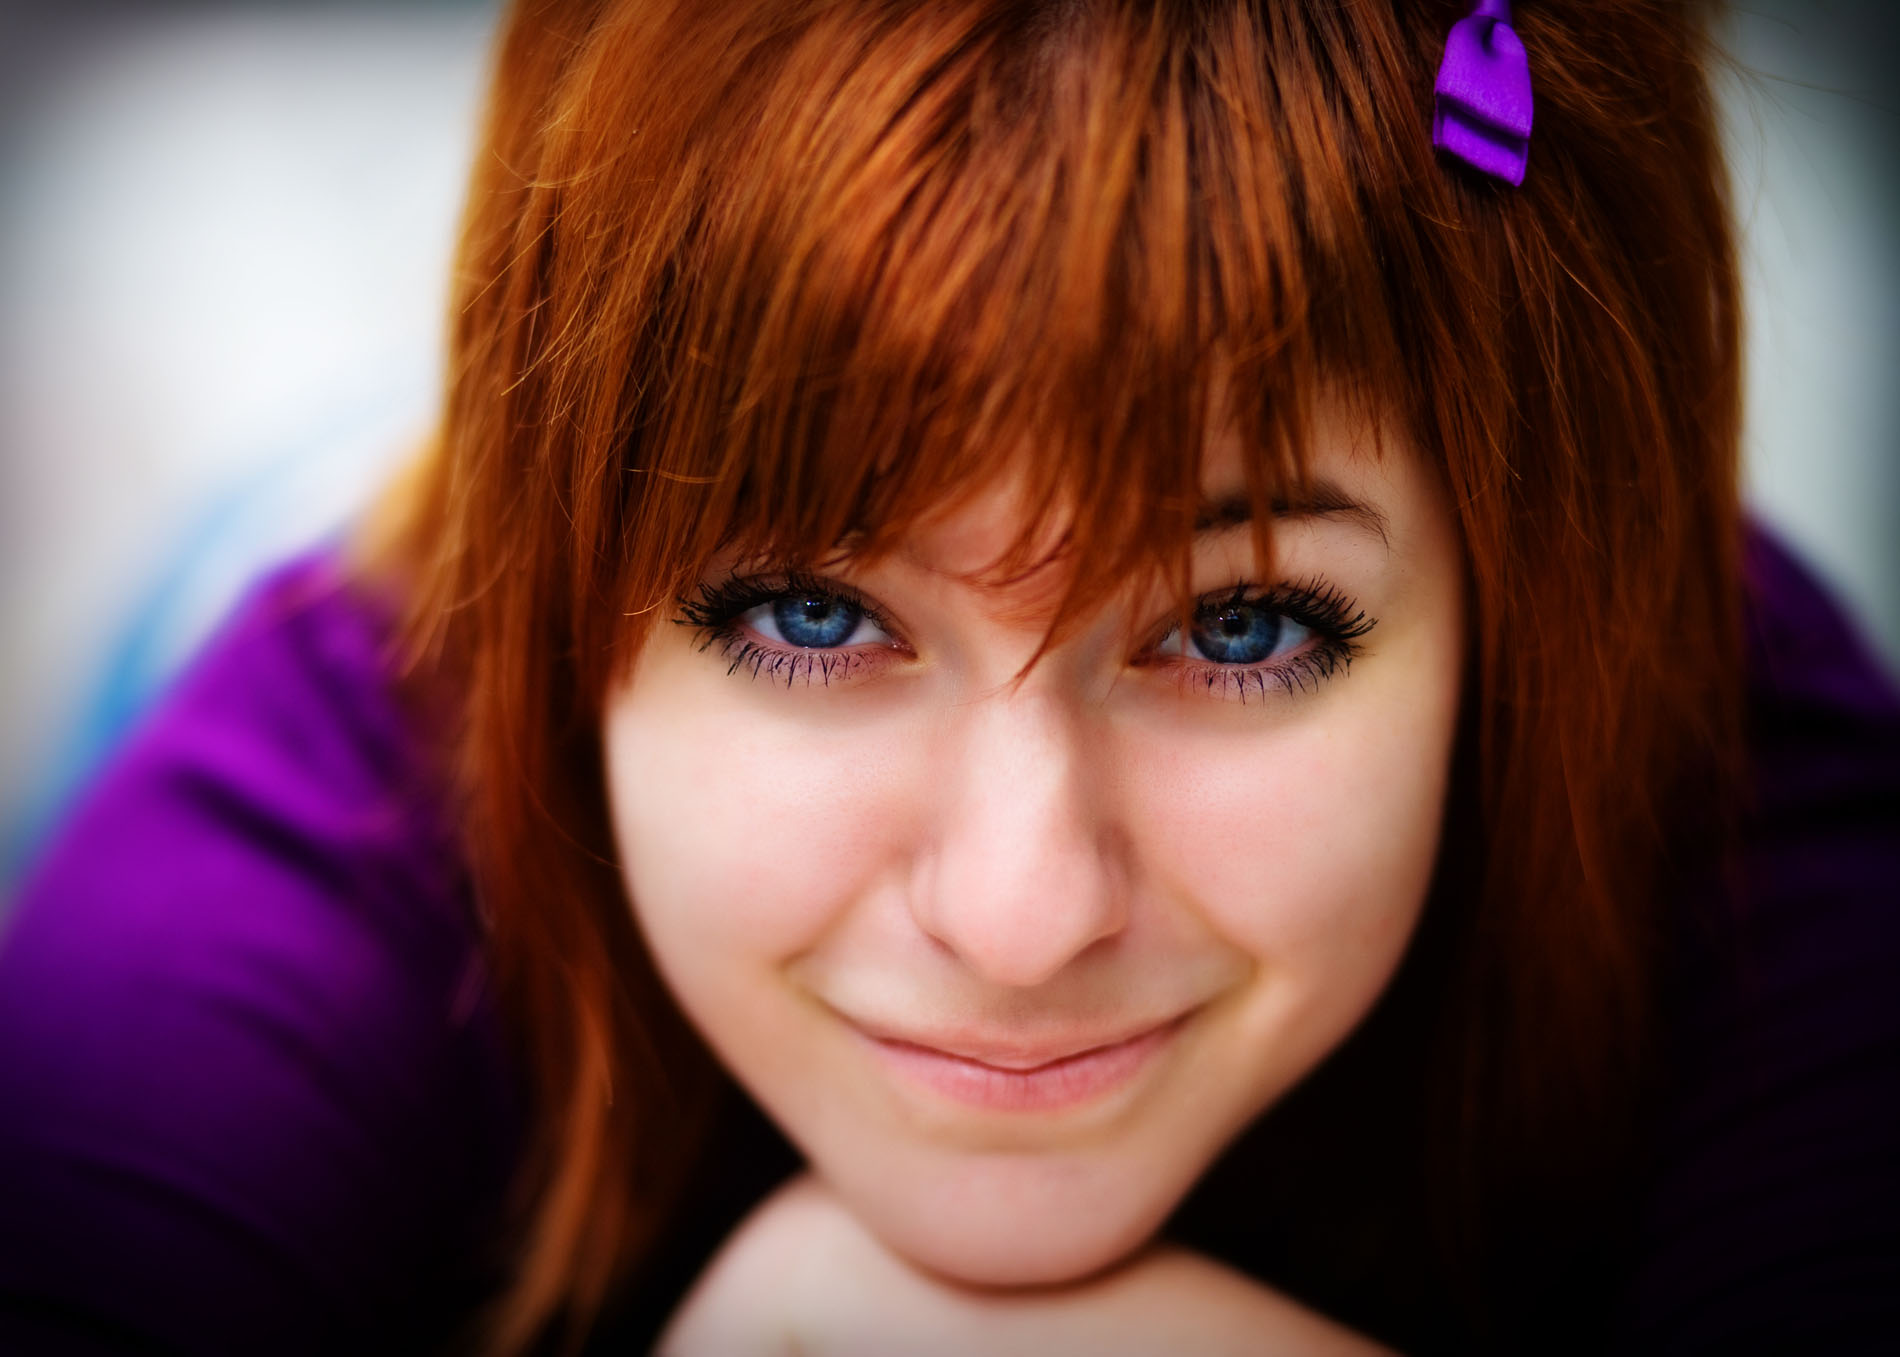 senior girl photographed close up